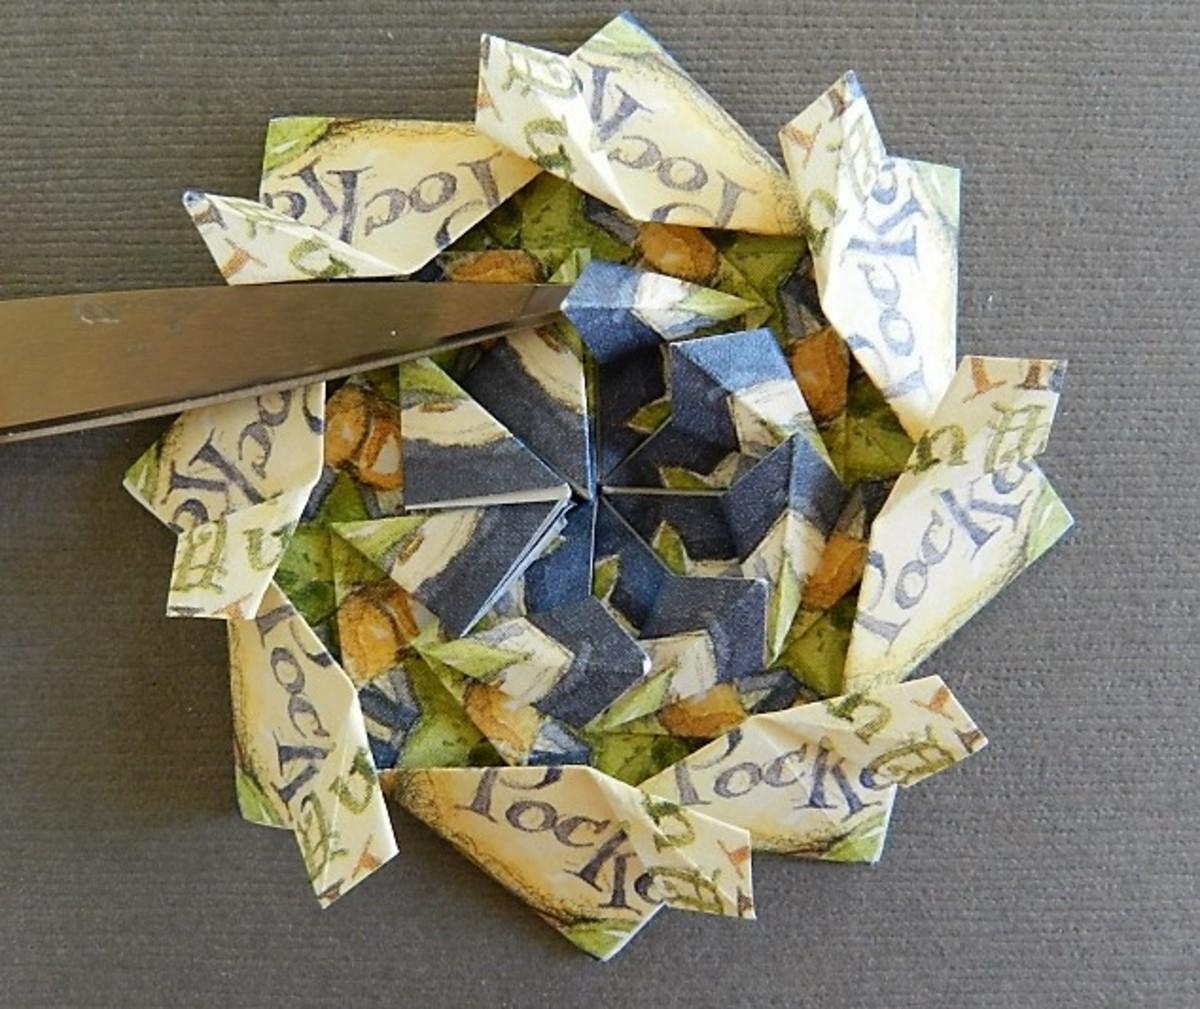 Open each fold into half kites.